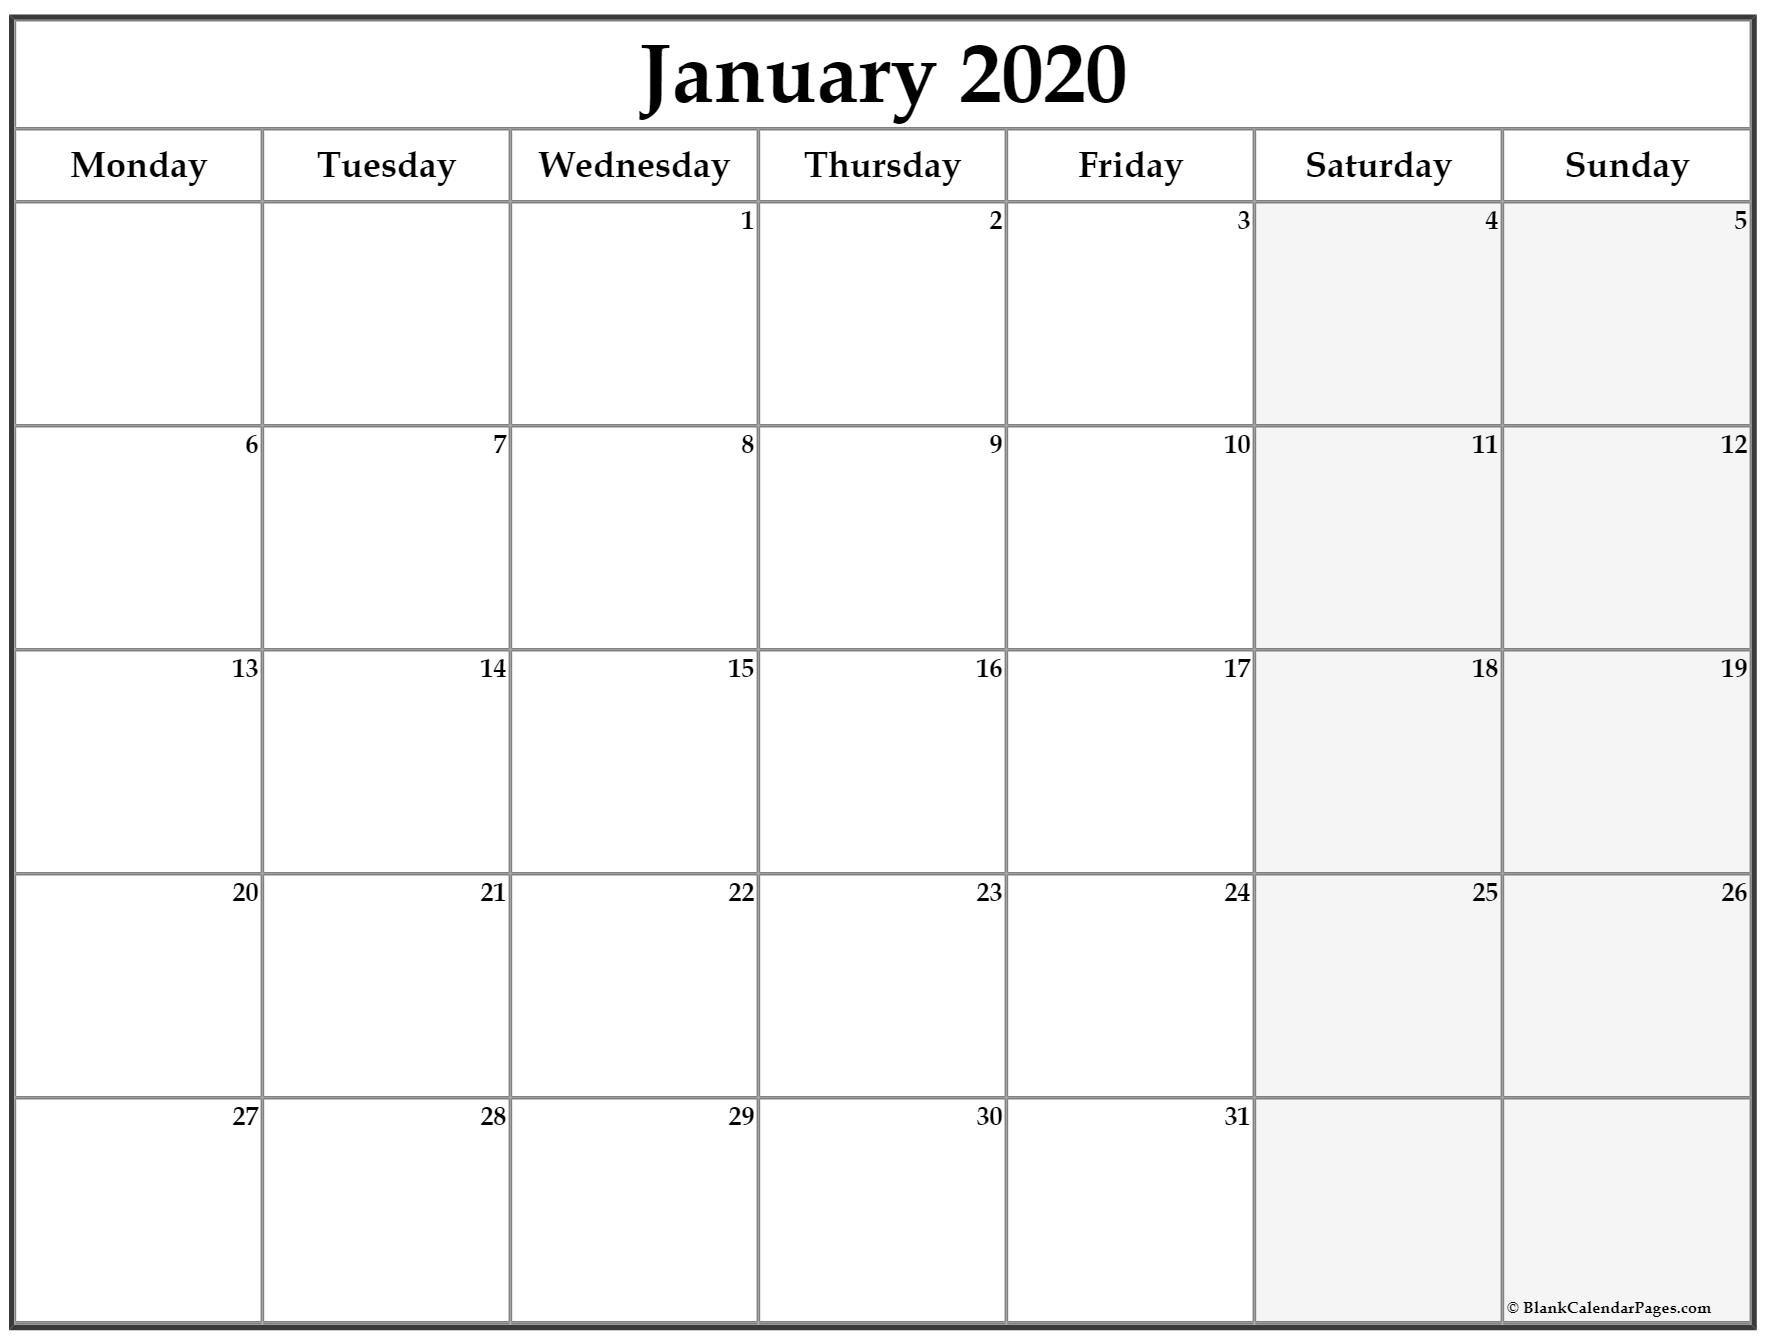 January 2020 Monday Calendar | Monday To Sunday Calendar Monday To Friday